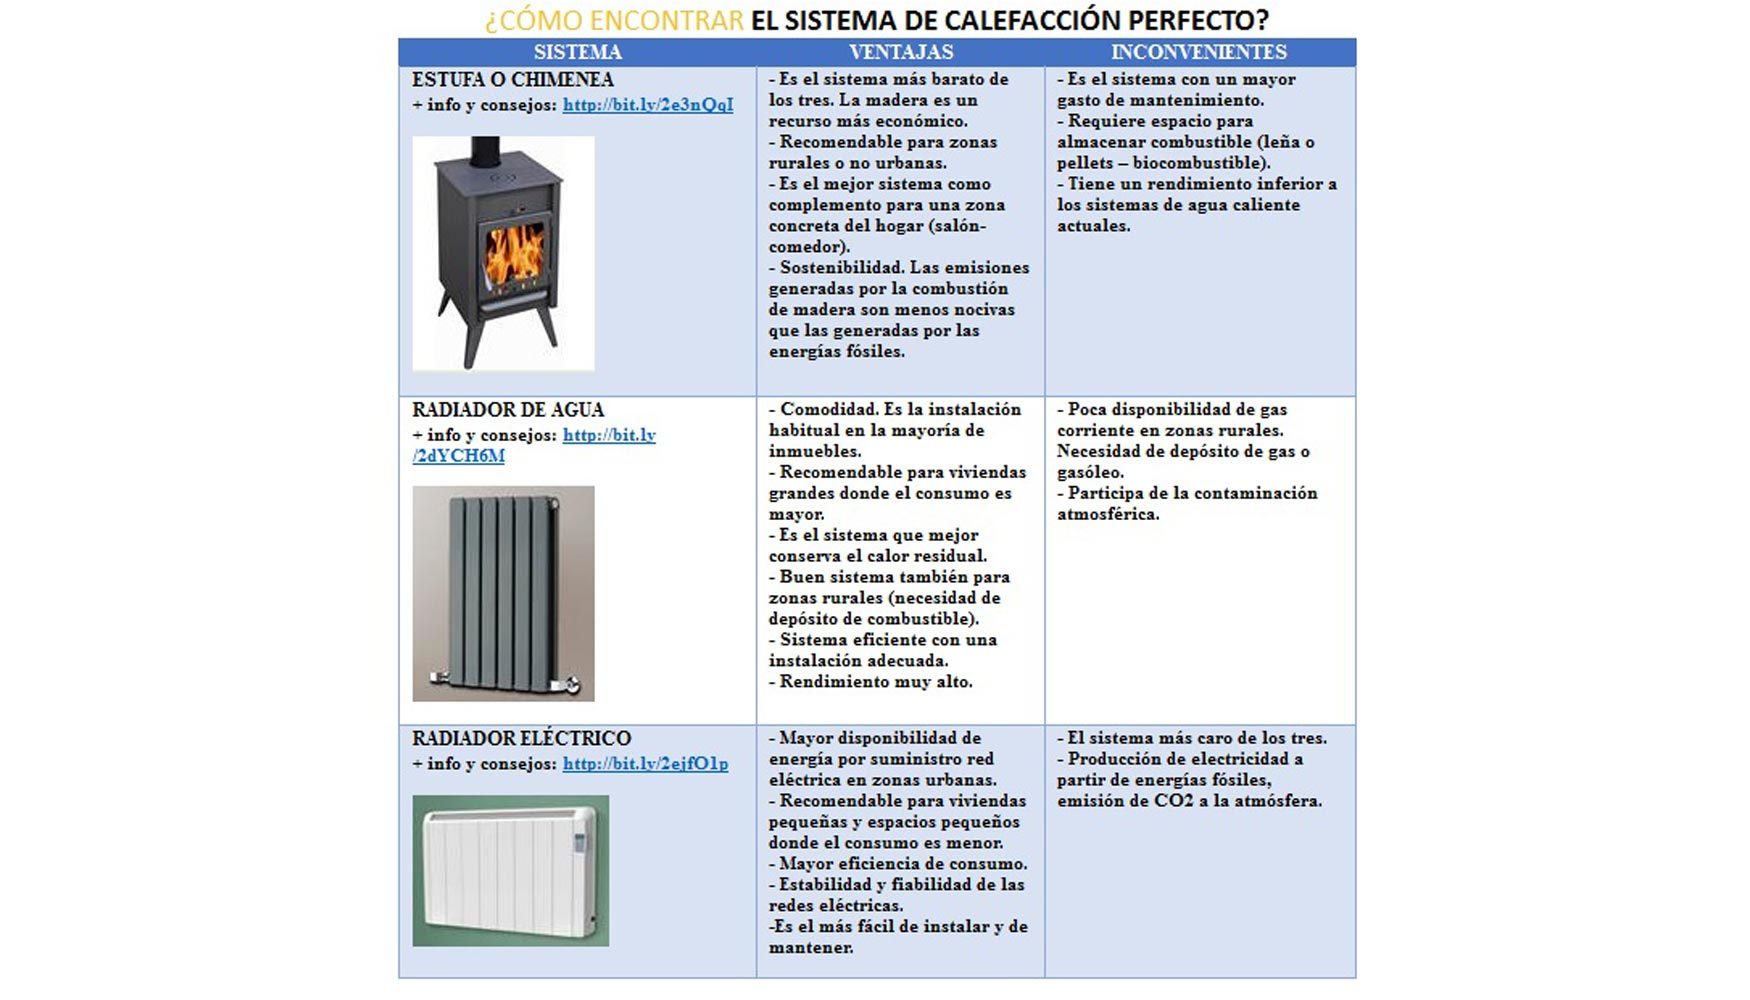 C mo elegir el mejor sistema de calefacci n para nuestro - Mejor sistema de calefaccion electrica ...